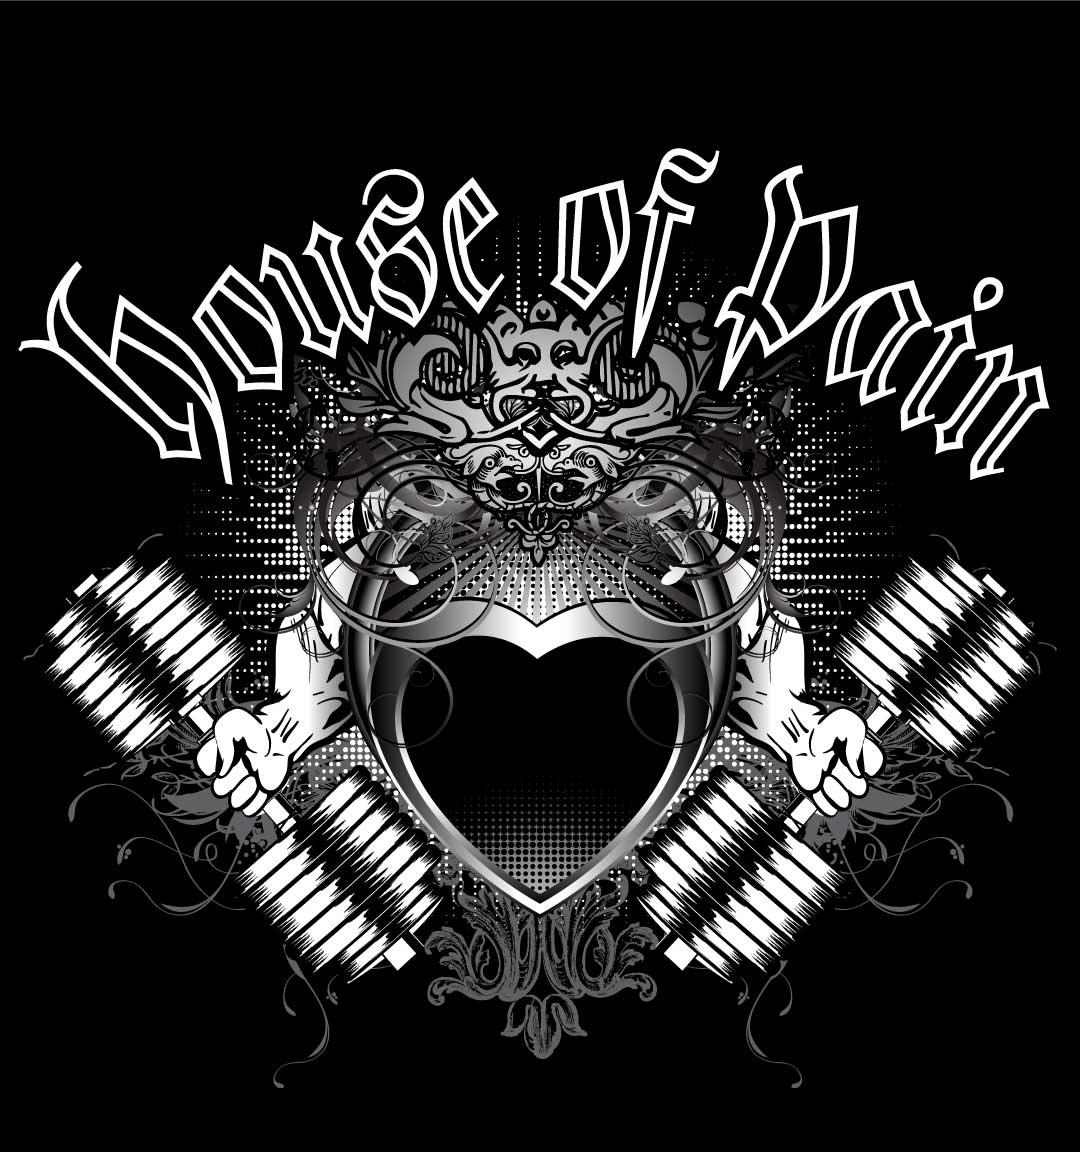 House-of-Pain-Shirt.jpg